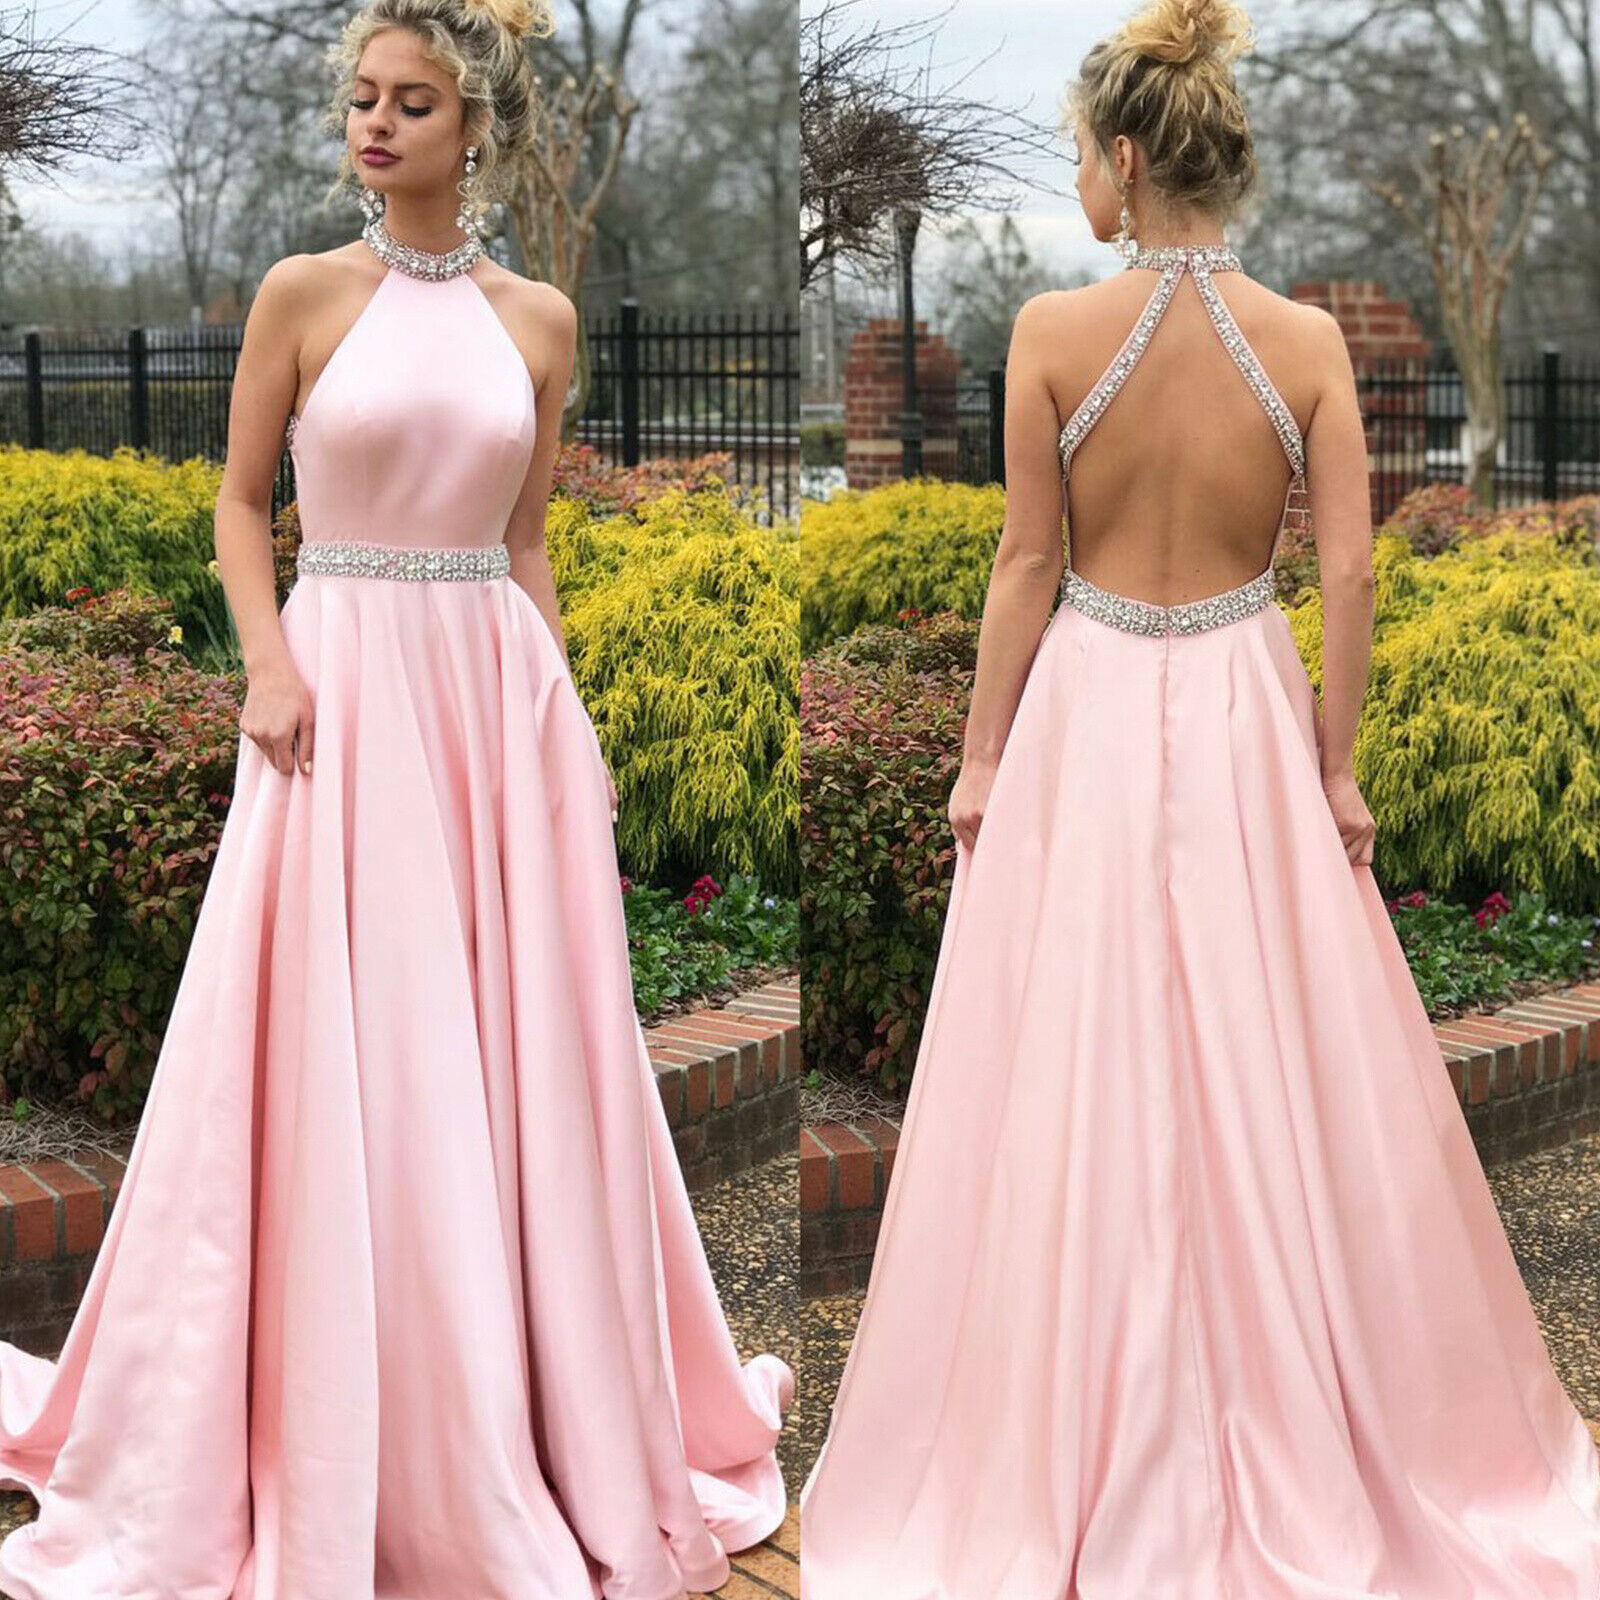 61c4b6638cb Maxi Dress Formal Dresses - Gomes Weine AG